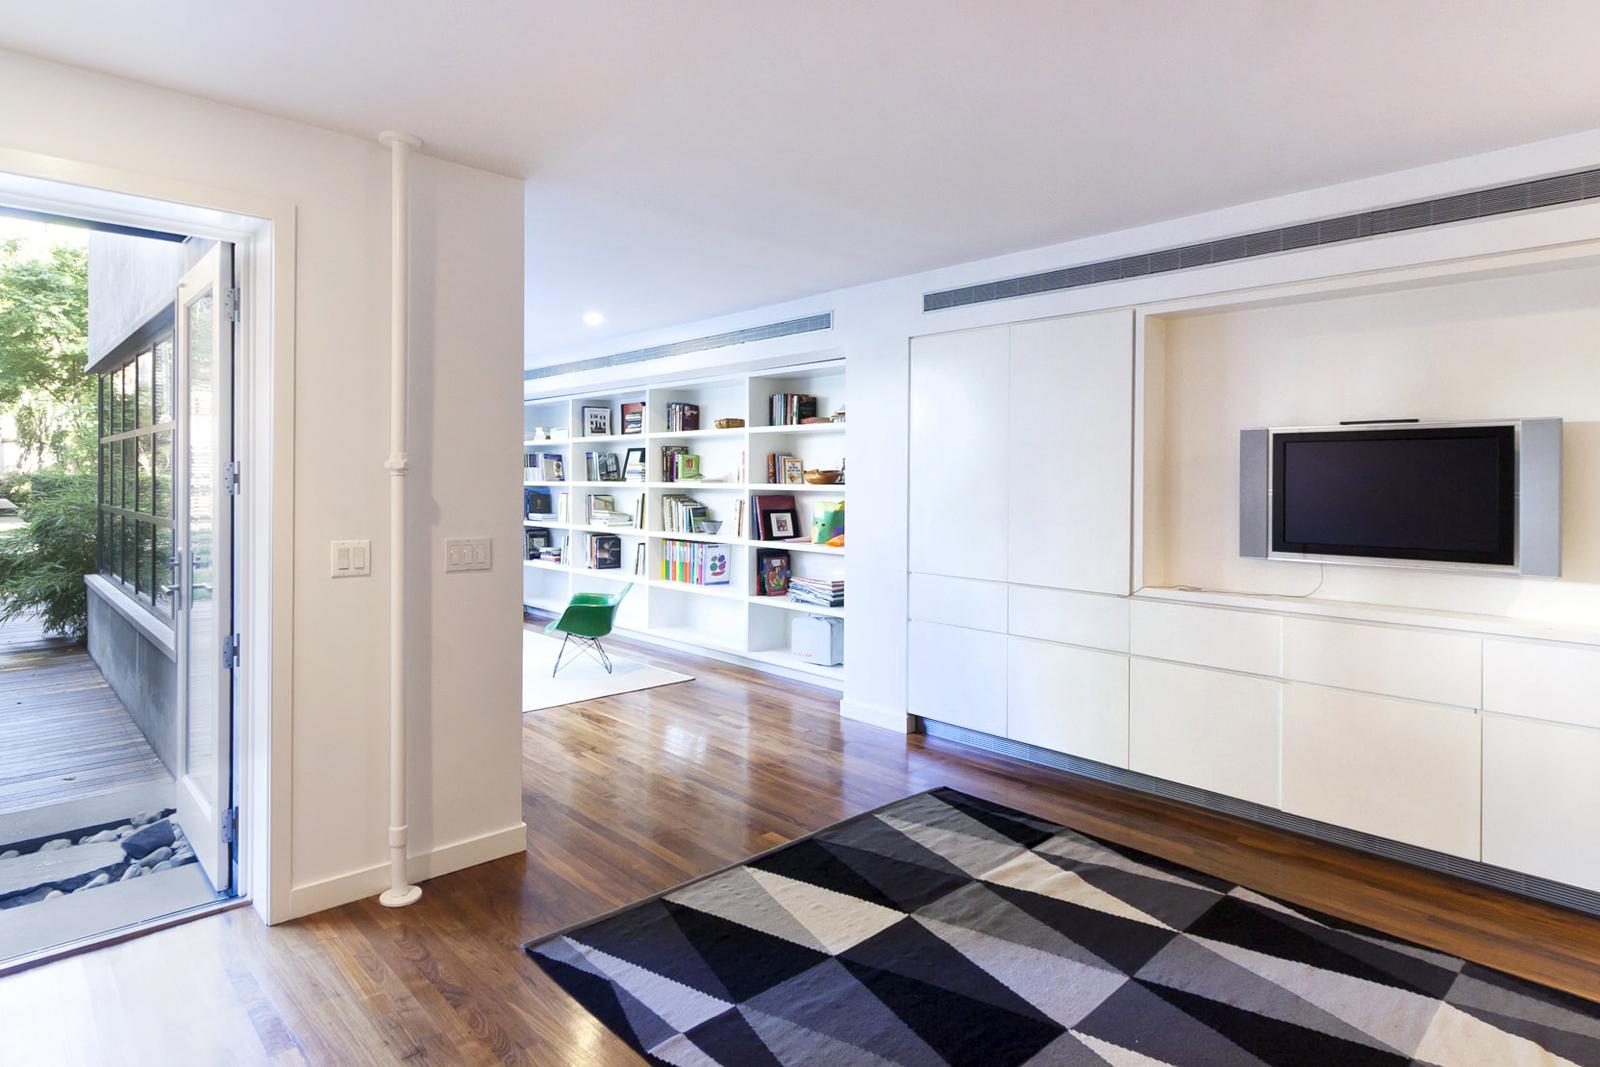 07-res4-resolution-4-architecture-modern-residential-warren-street-townhouse-interior-living-room-03.jpg